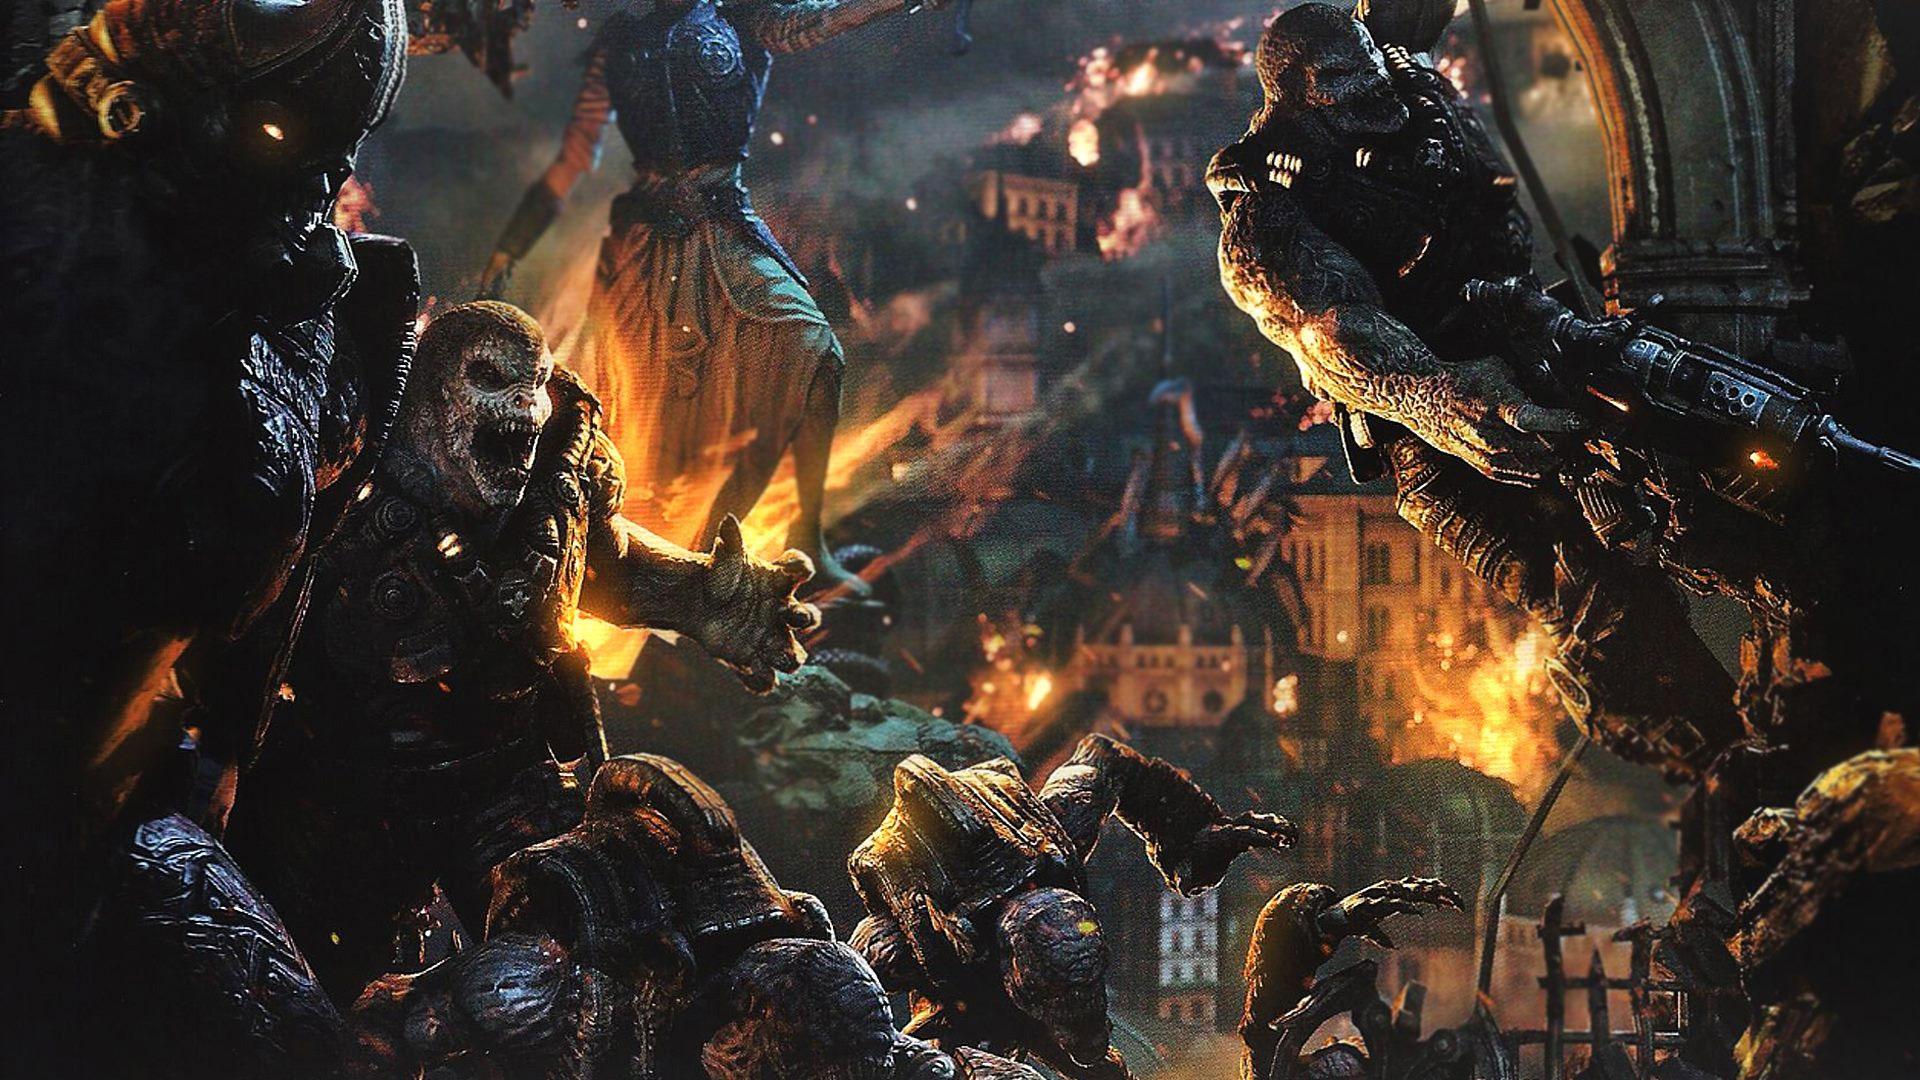 League Of Overwatch >> Gears-of-War-4-1080-Wallpaper - Gameranx